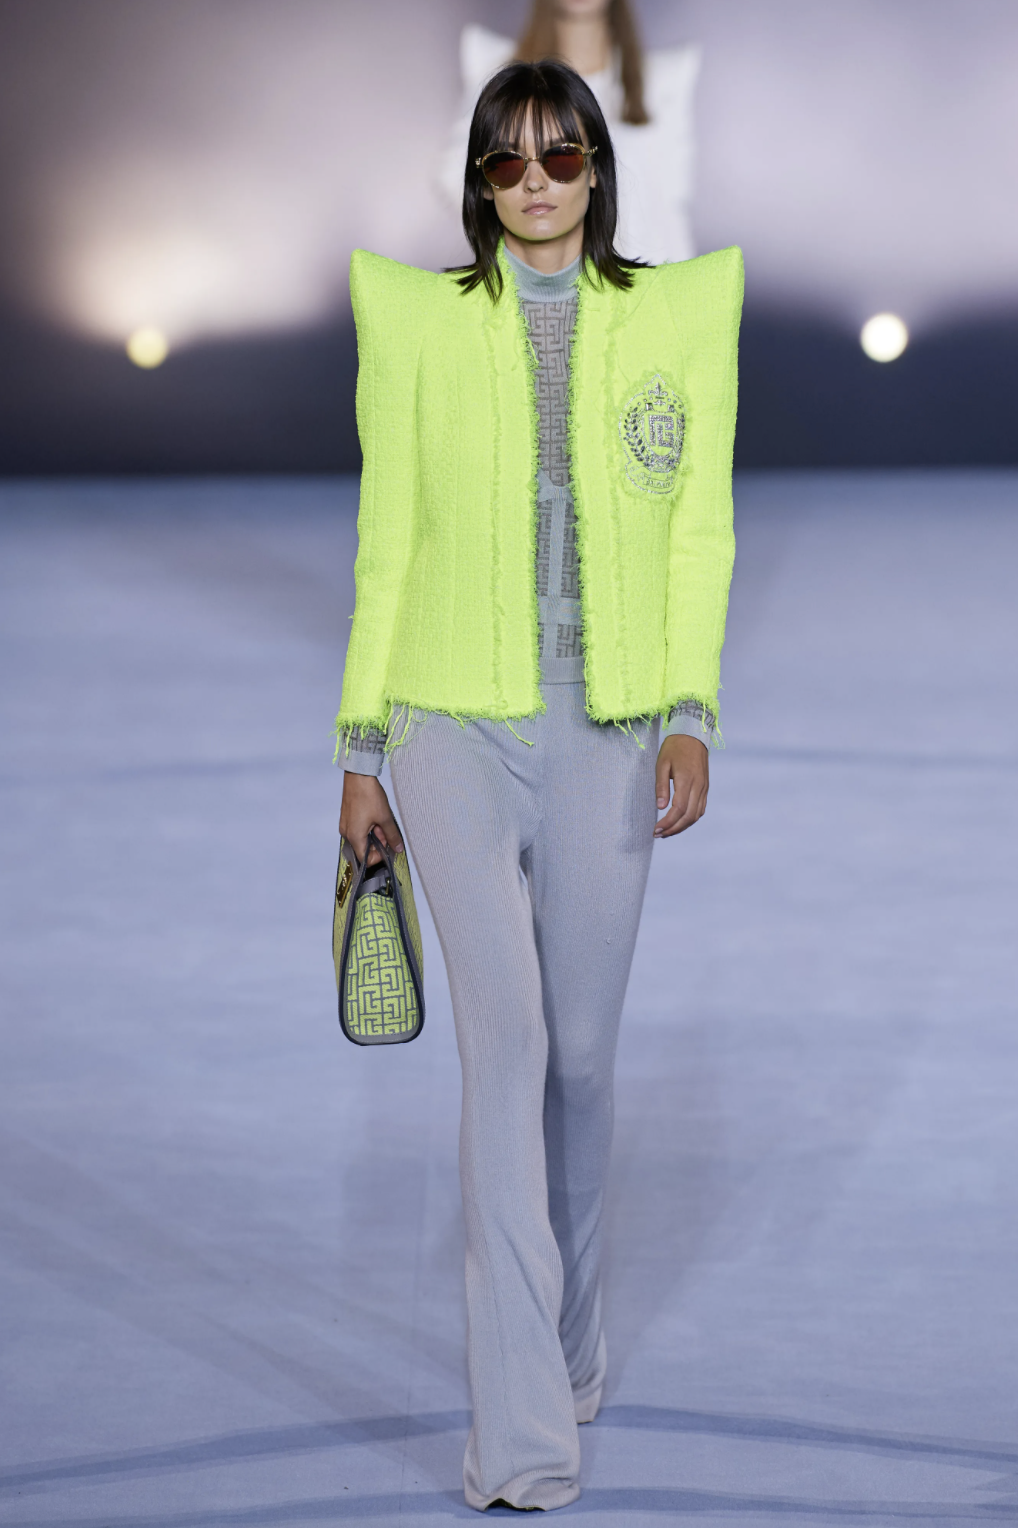 fashion trends, extravagant shoulders, padded shoulders,